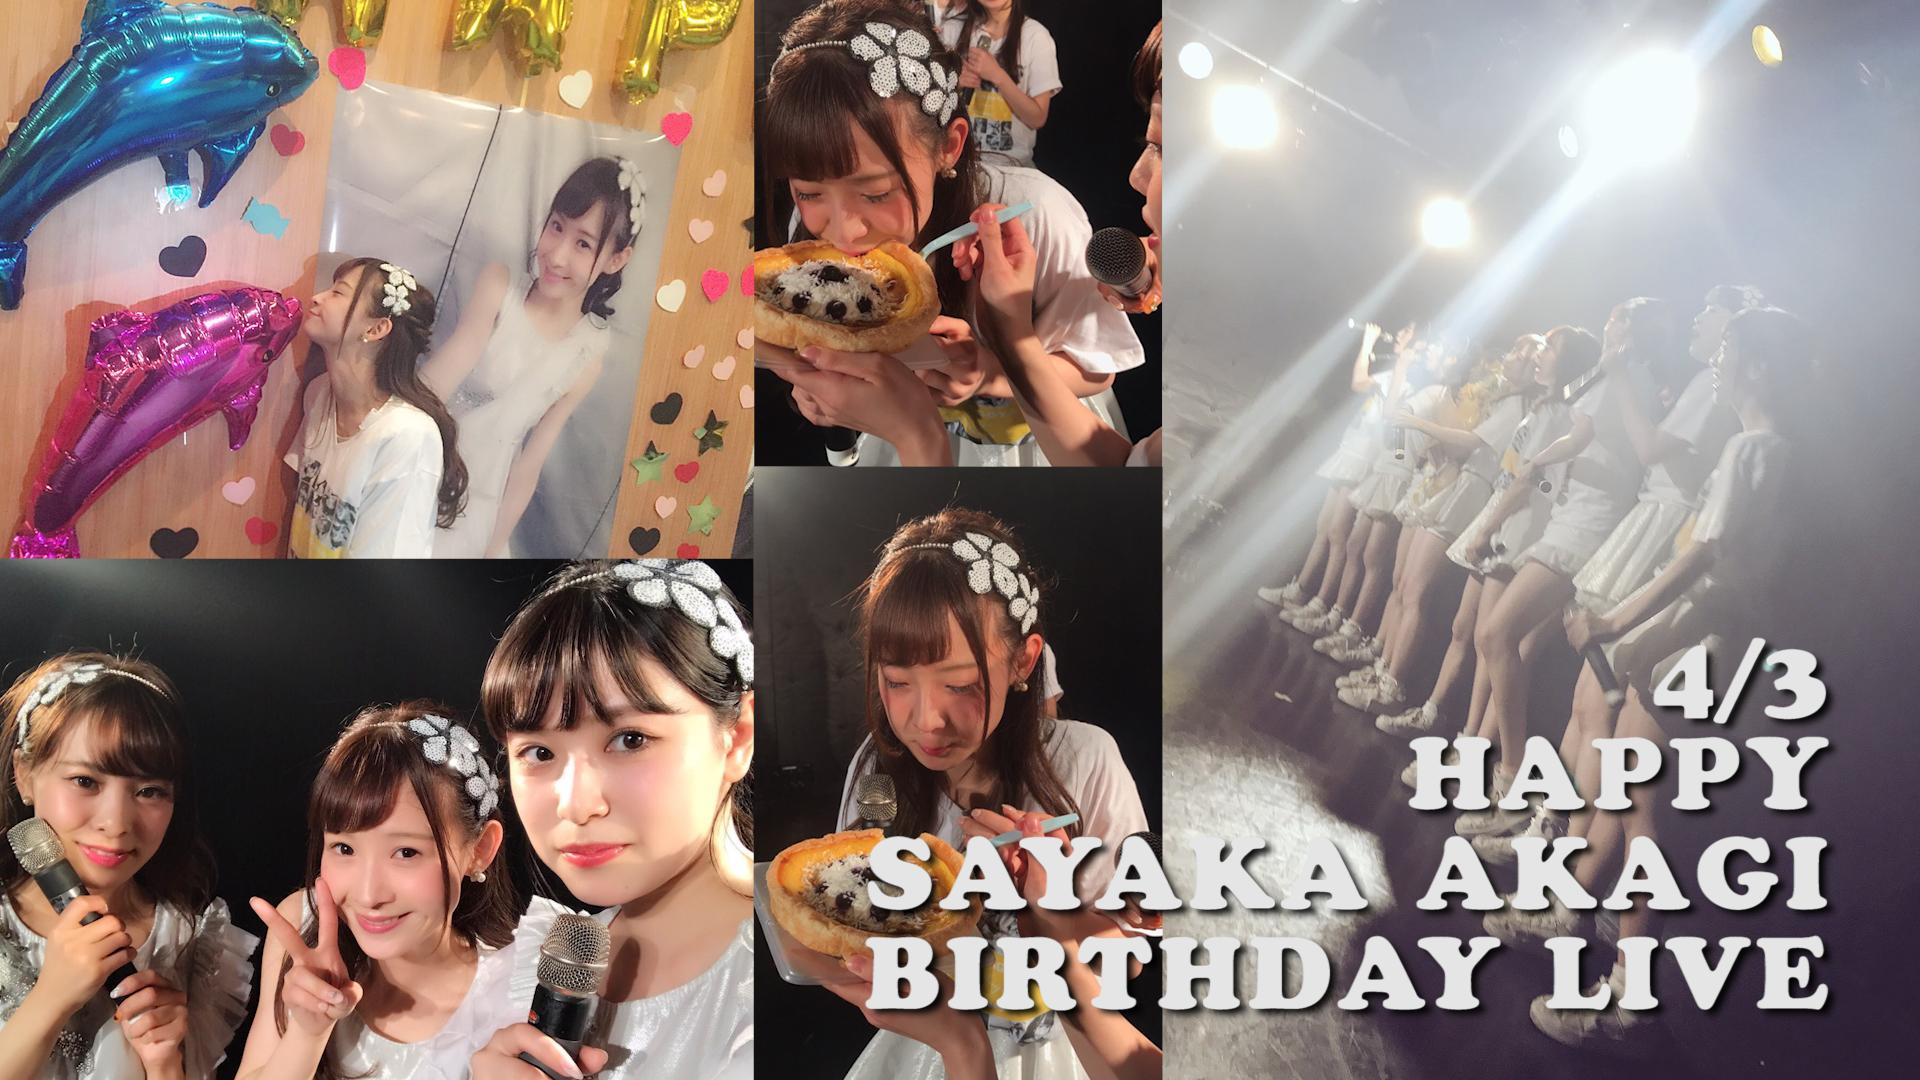 4/3 HAPPY SAYAKA AKAGI BIRTHDAY